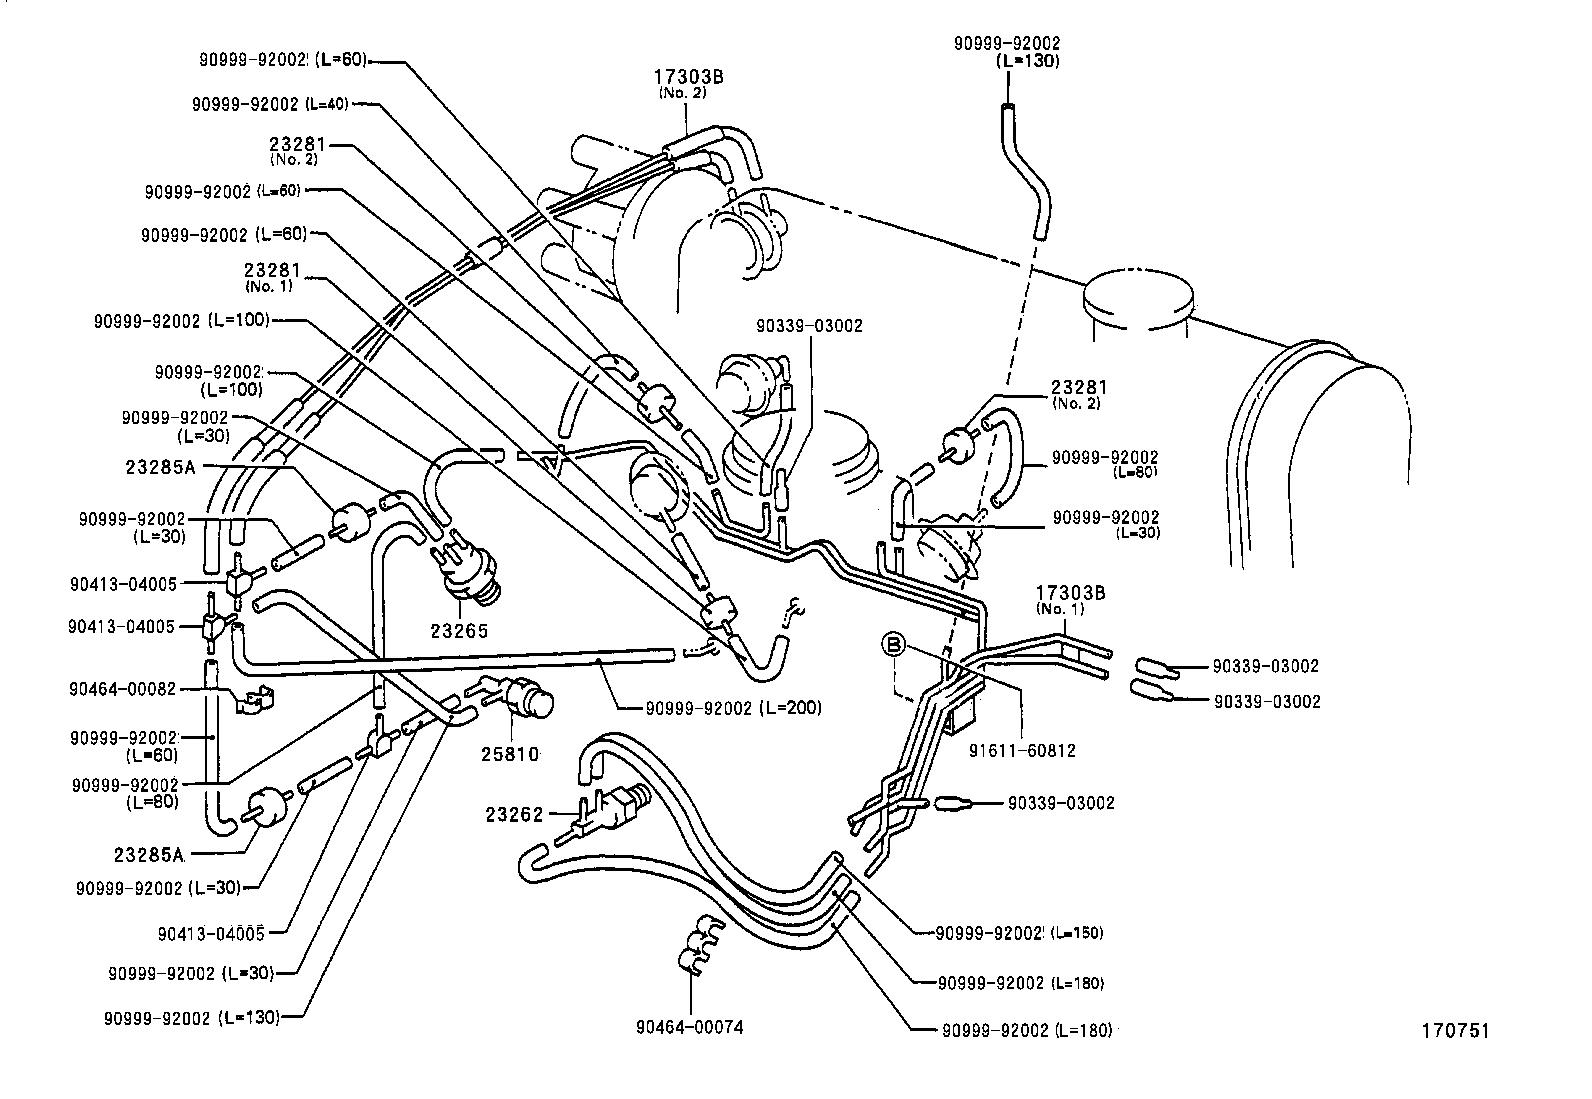 2003 Toyota Camry Le Wiring Diagram Gota Wiring Diagram